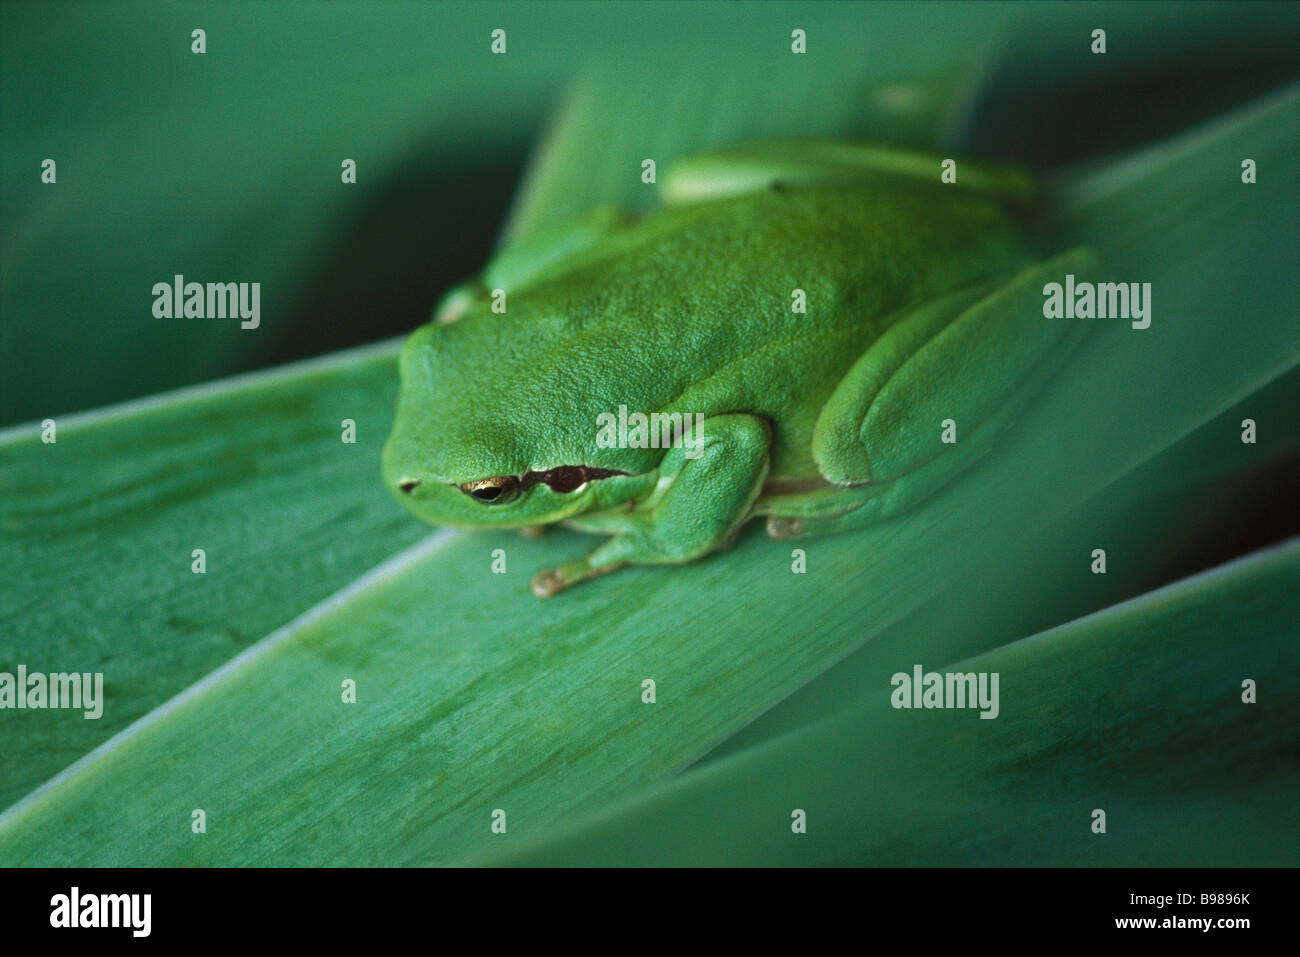 Mediterranean Tree Frog (Hyla meridionalis) - Stock Image